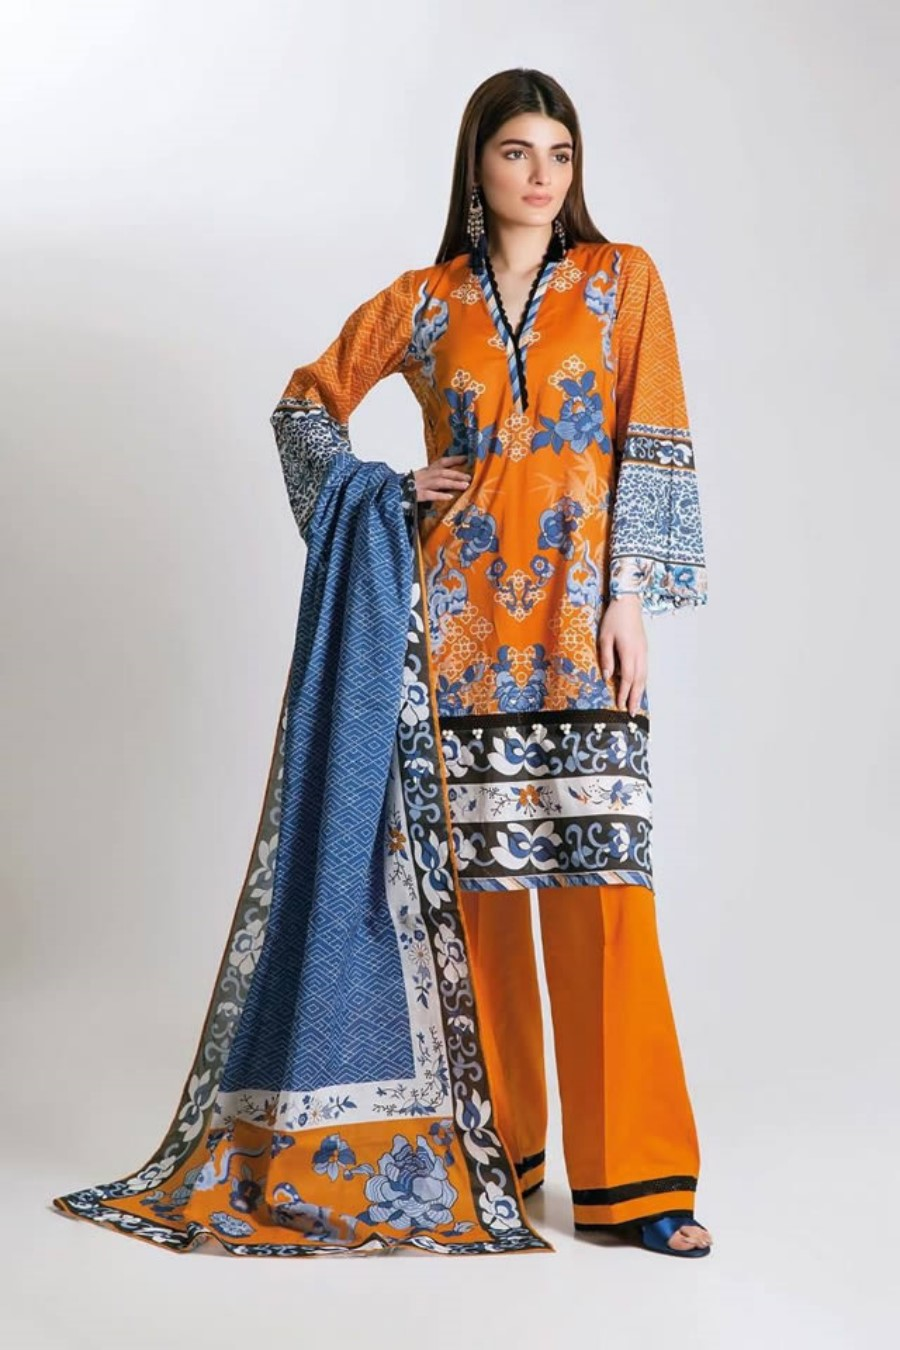 Latest Khaadi-party-dresses10